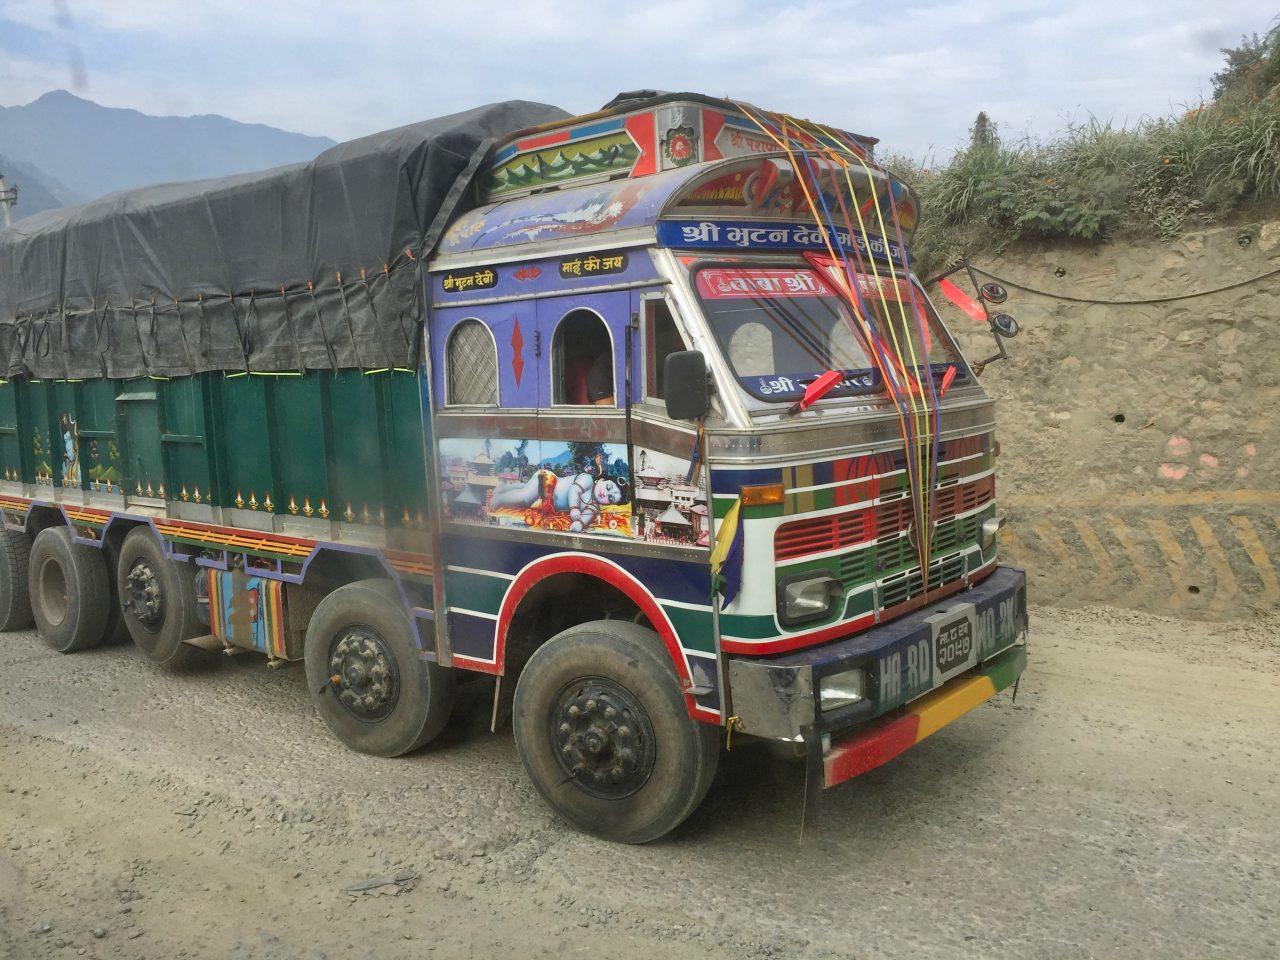 Busfahrt von Kathmandu nach Soti Khola